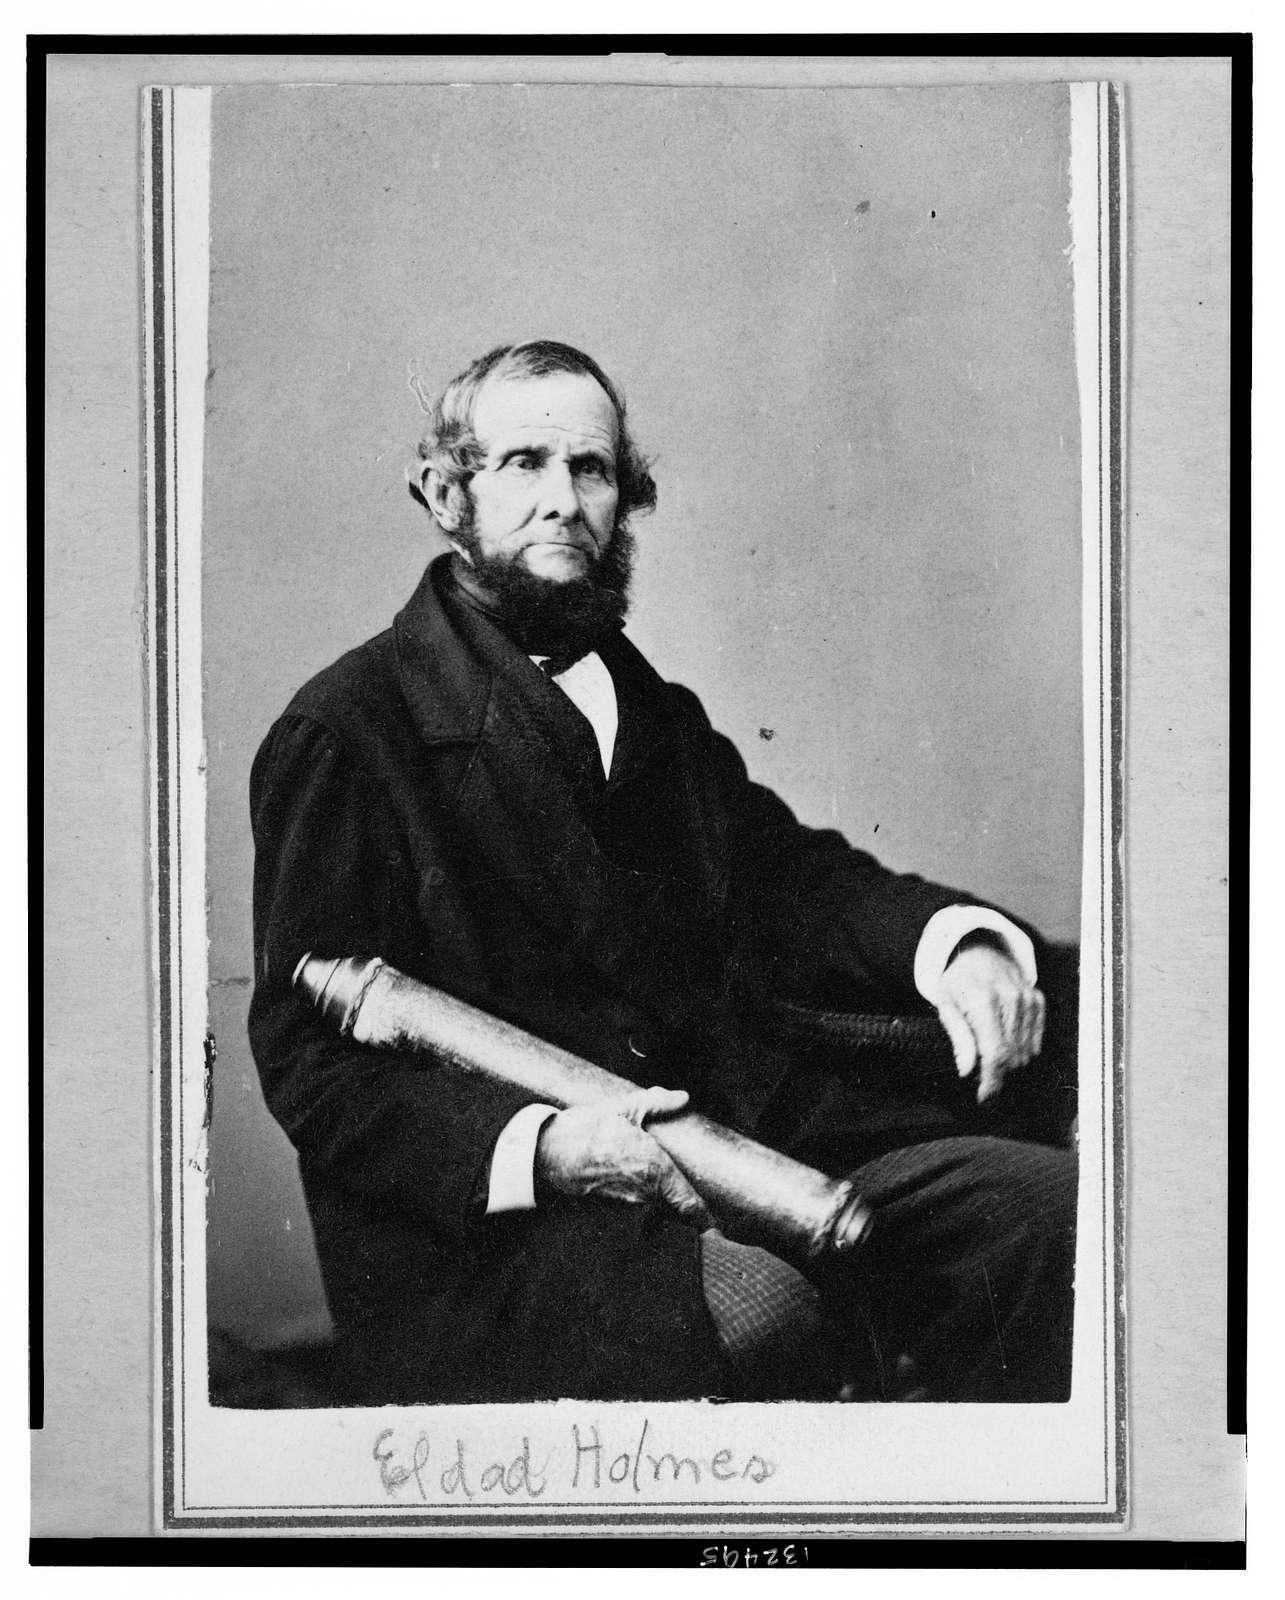 [Eldad Holmes, New York City merchant, half-length portrait, seated holding a telescope(?), facing right]